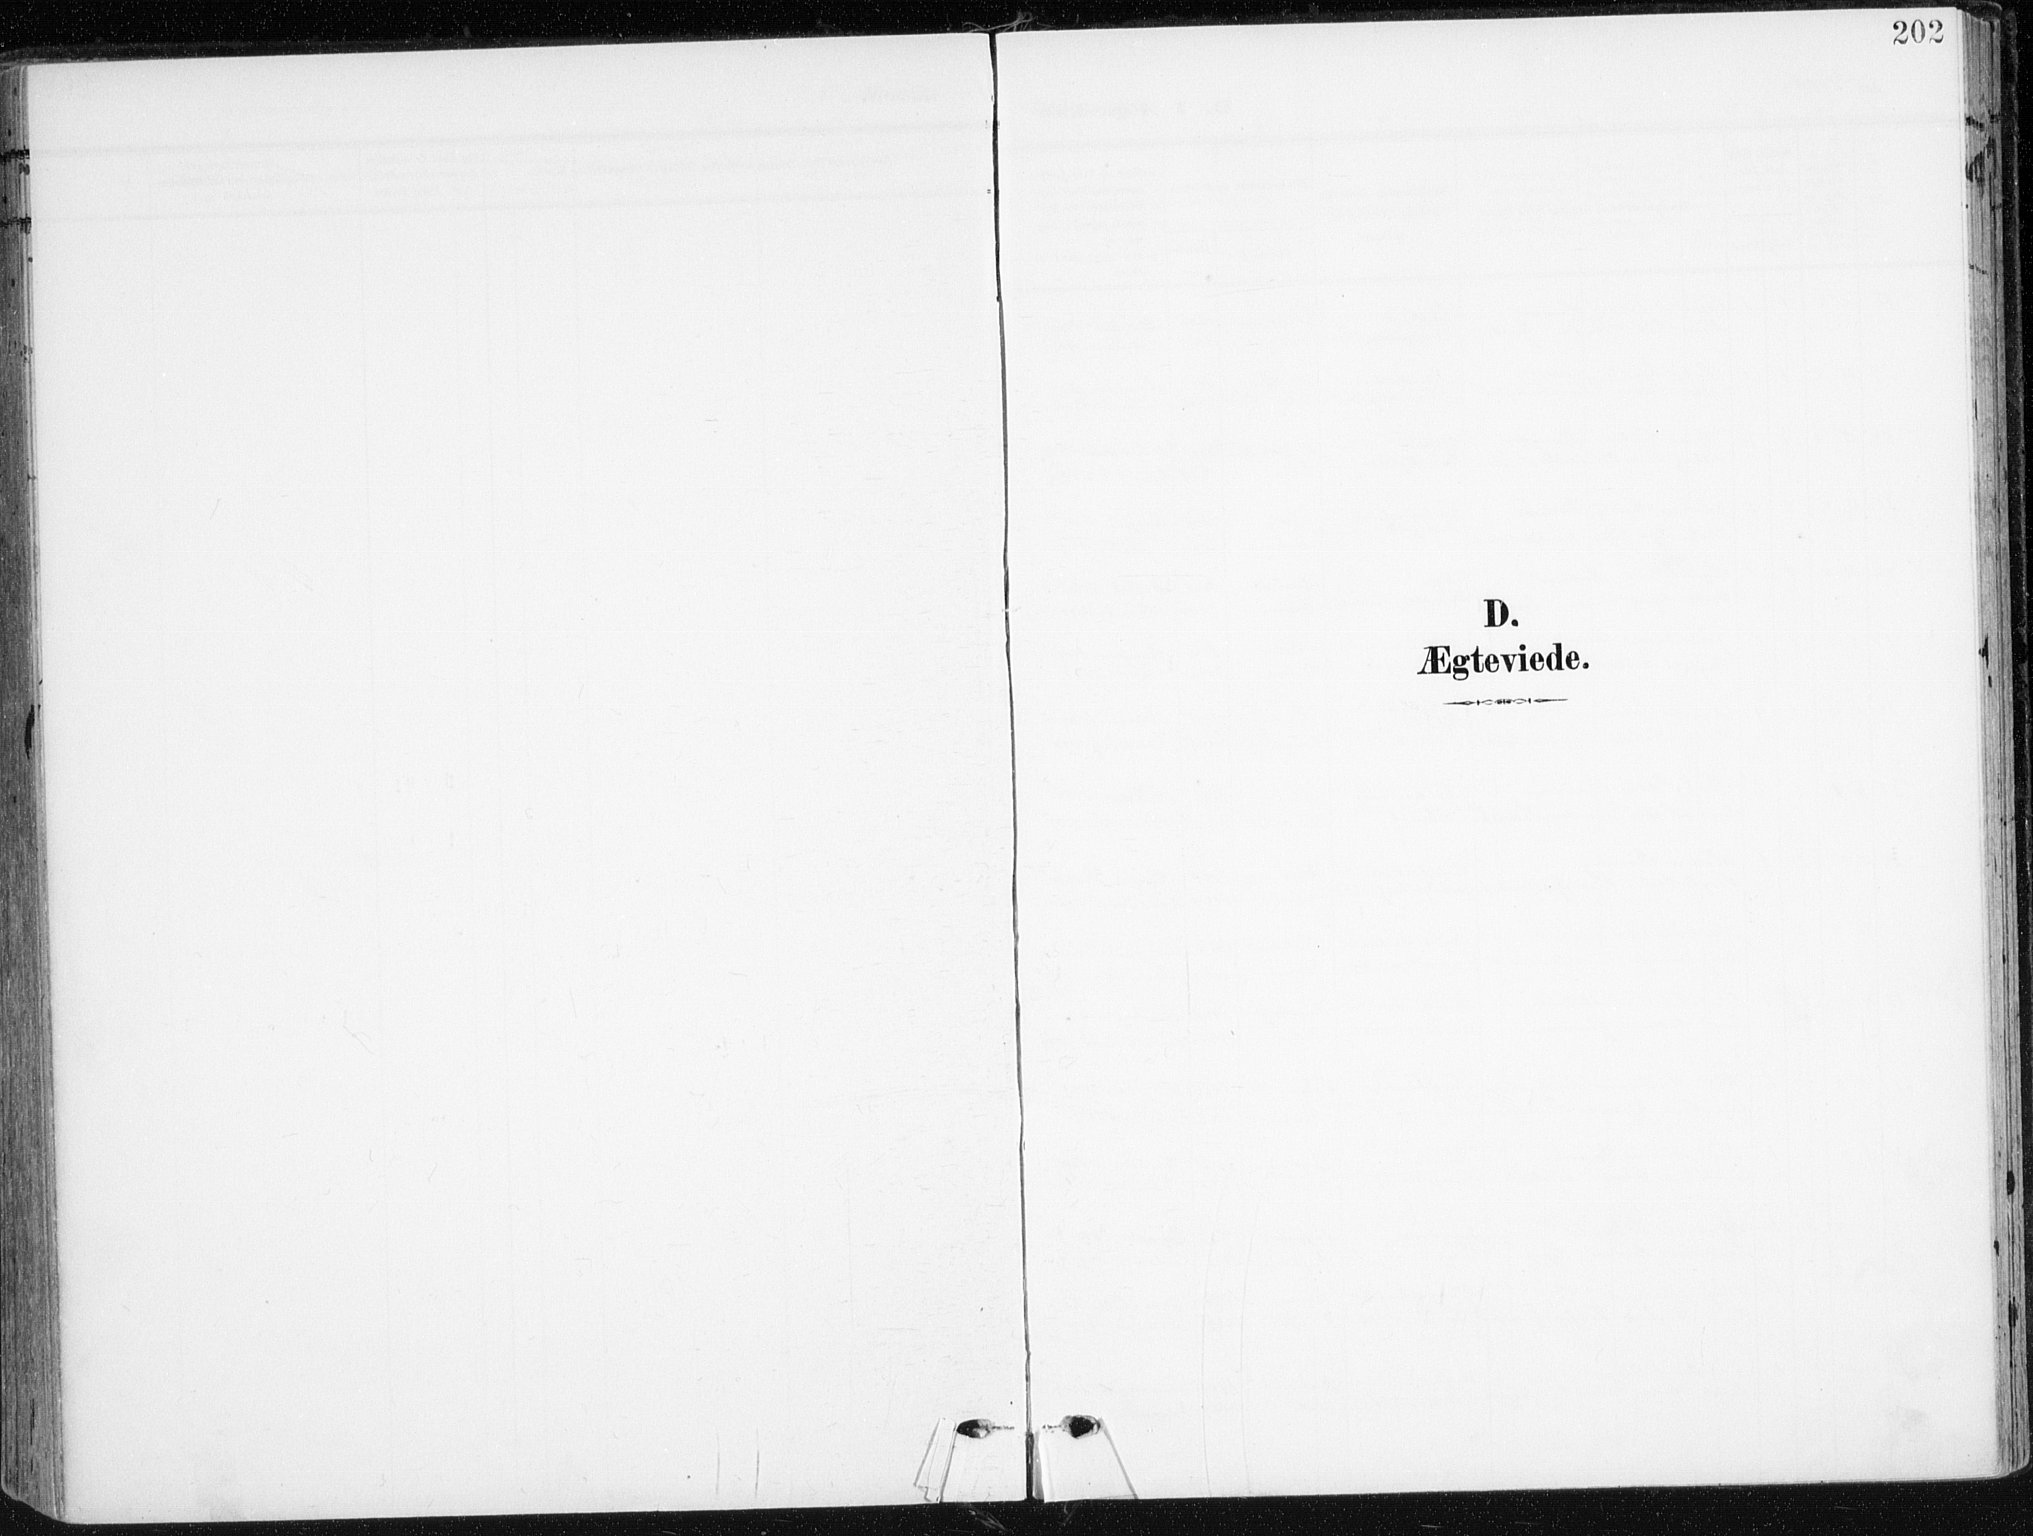 SAO, Kampen prestekontor Kirkebøker, F/Fa/L0011: Parish register (official) no. I 11, 1907-1917, p. 202